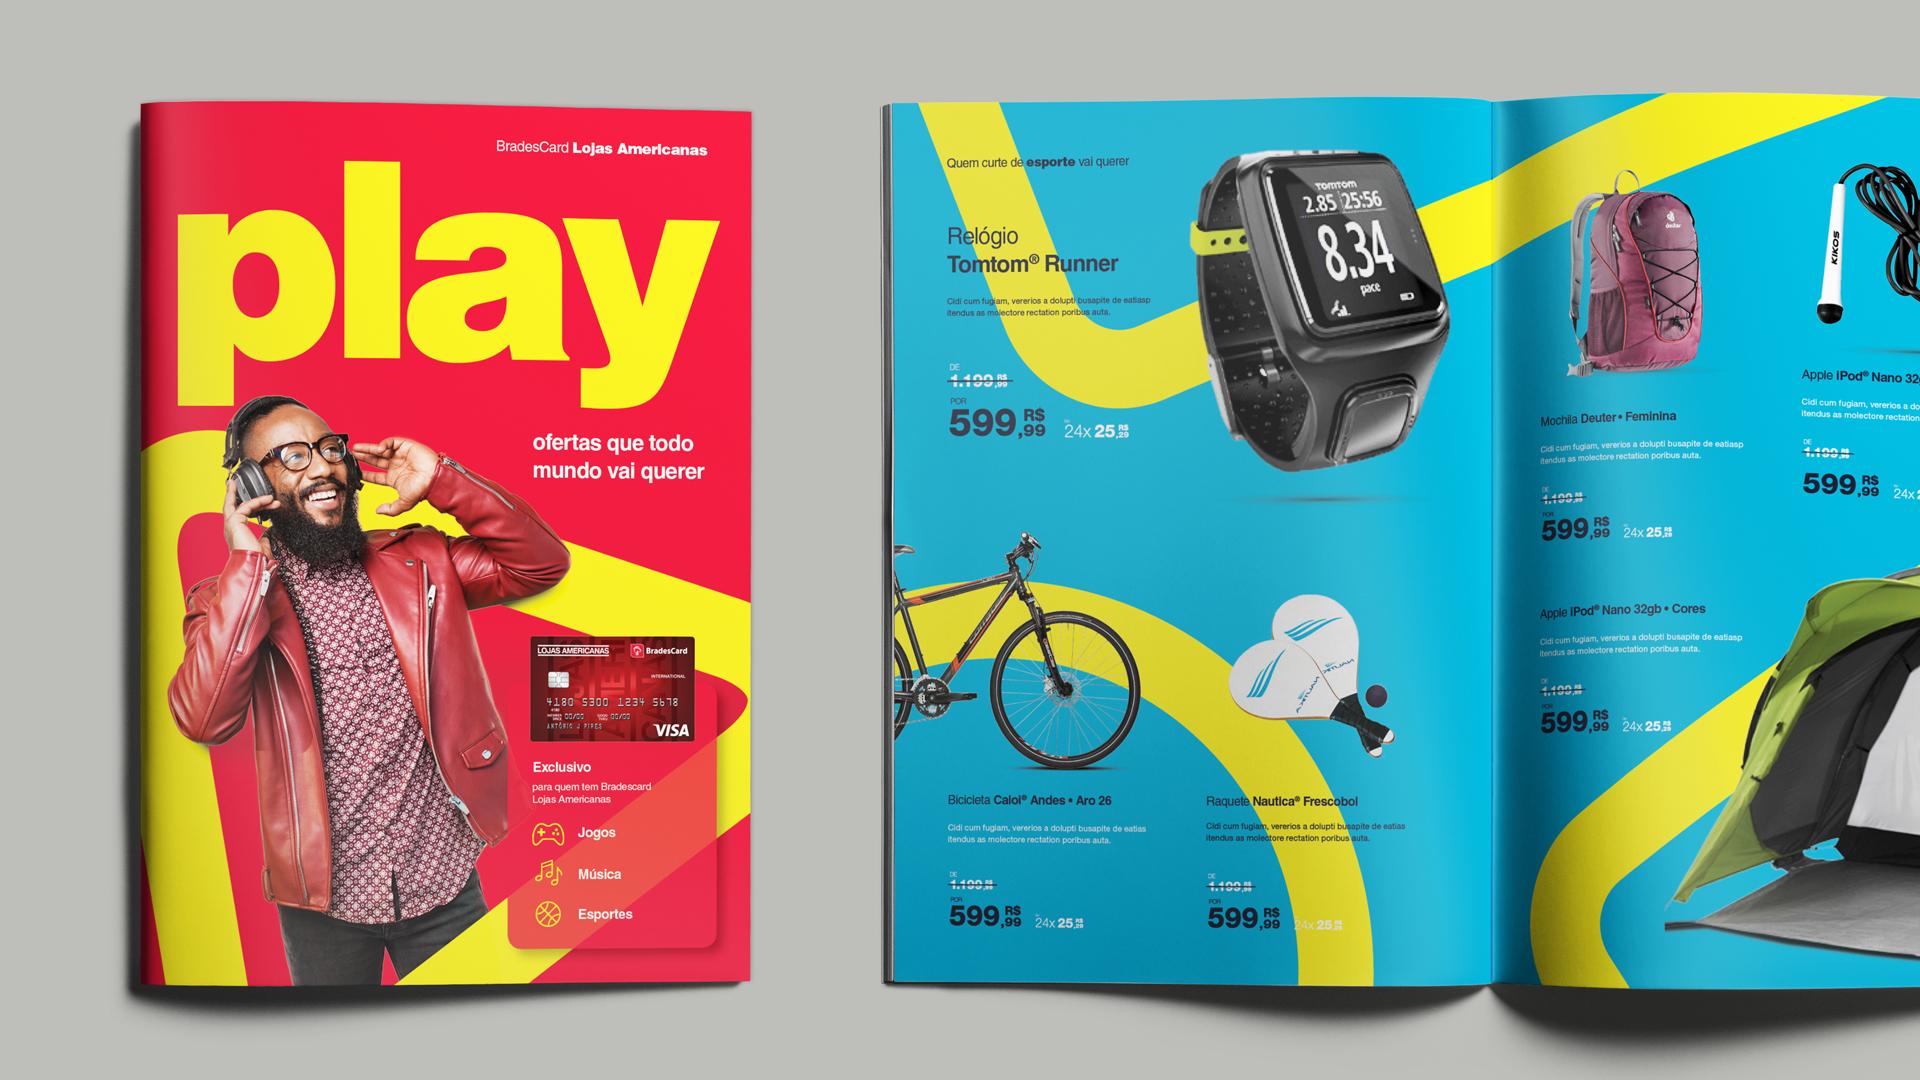 revista-play-americanas.jpg